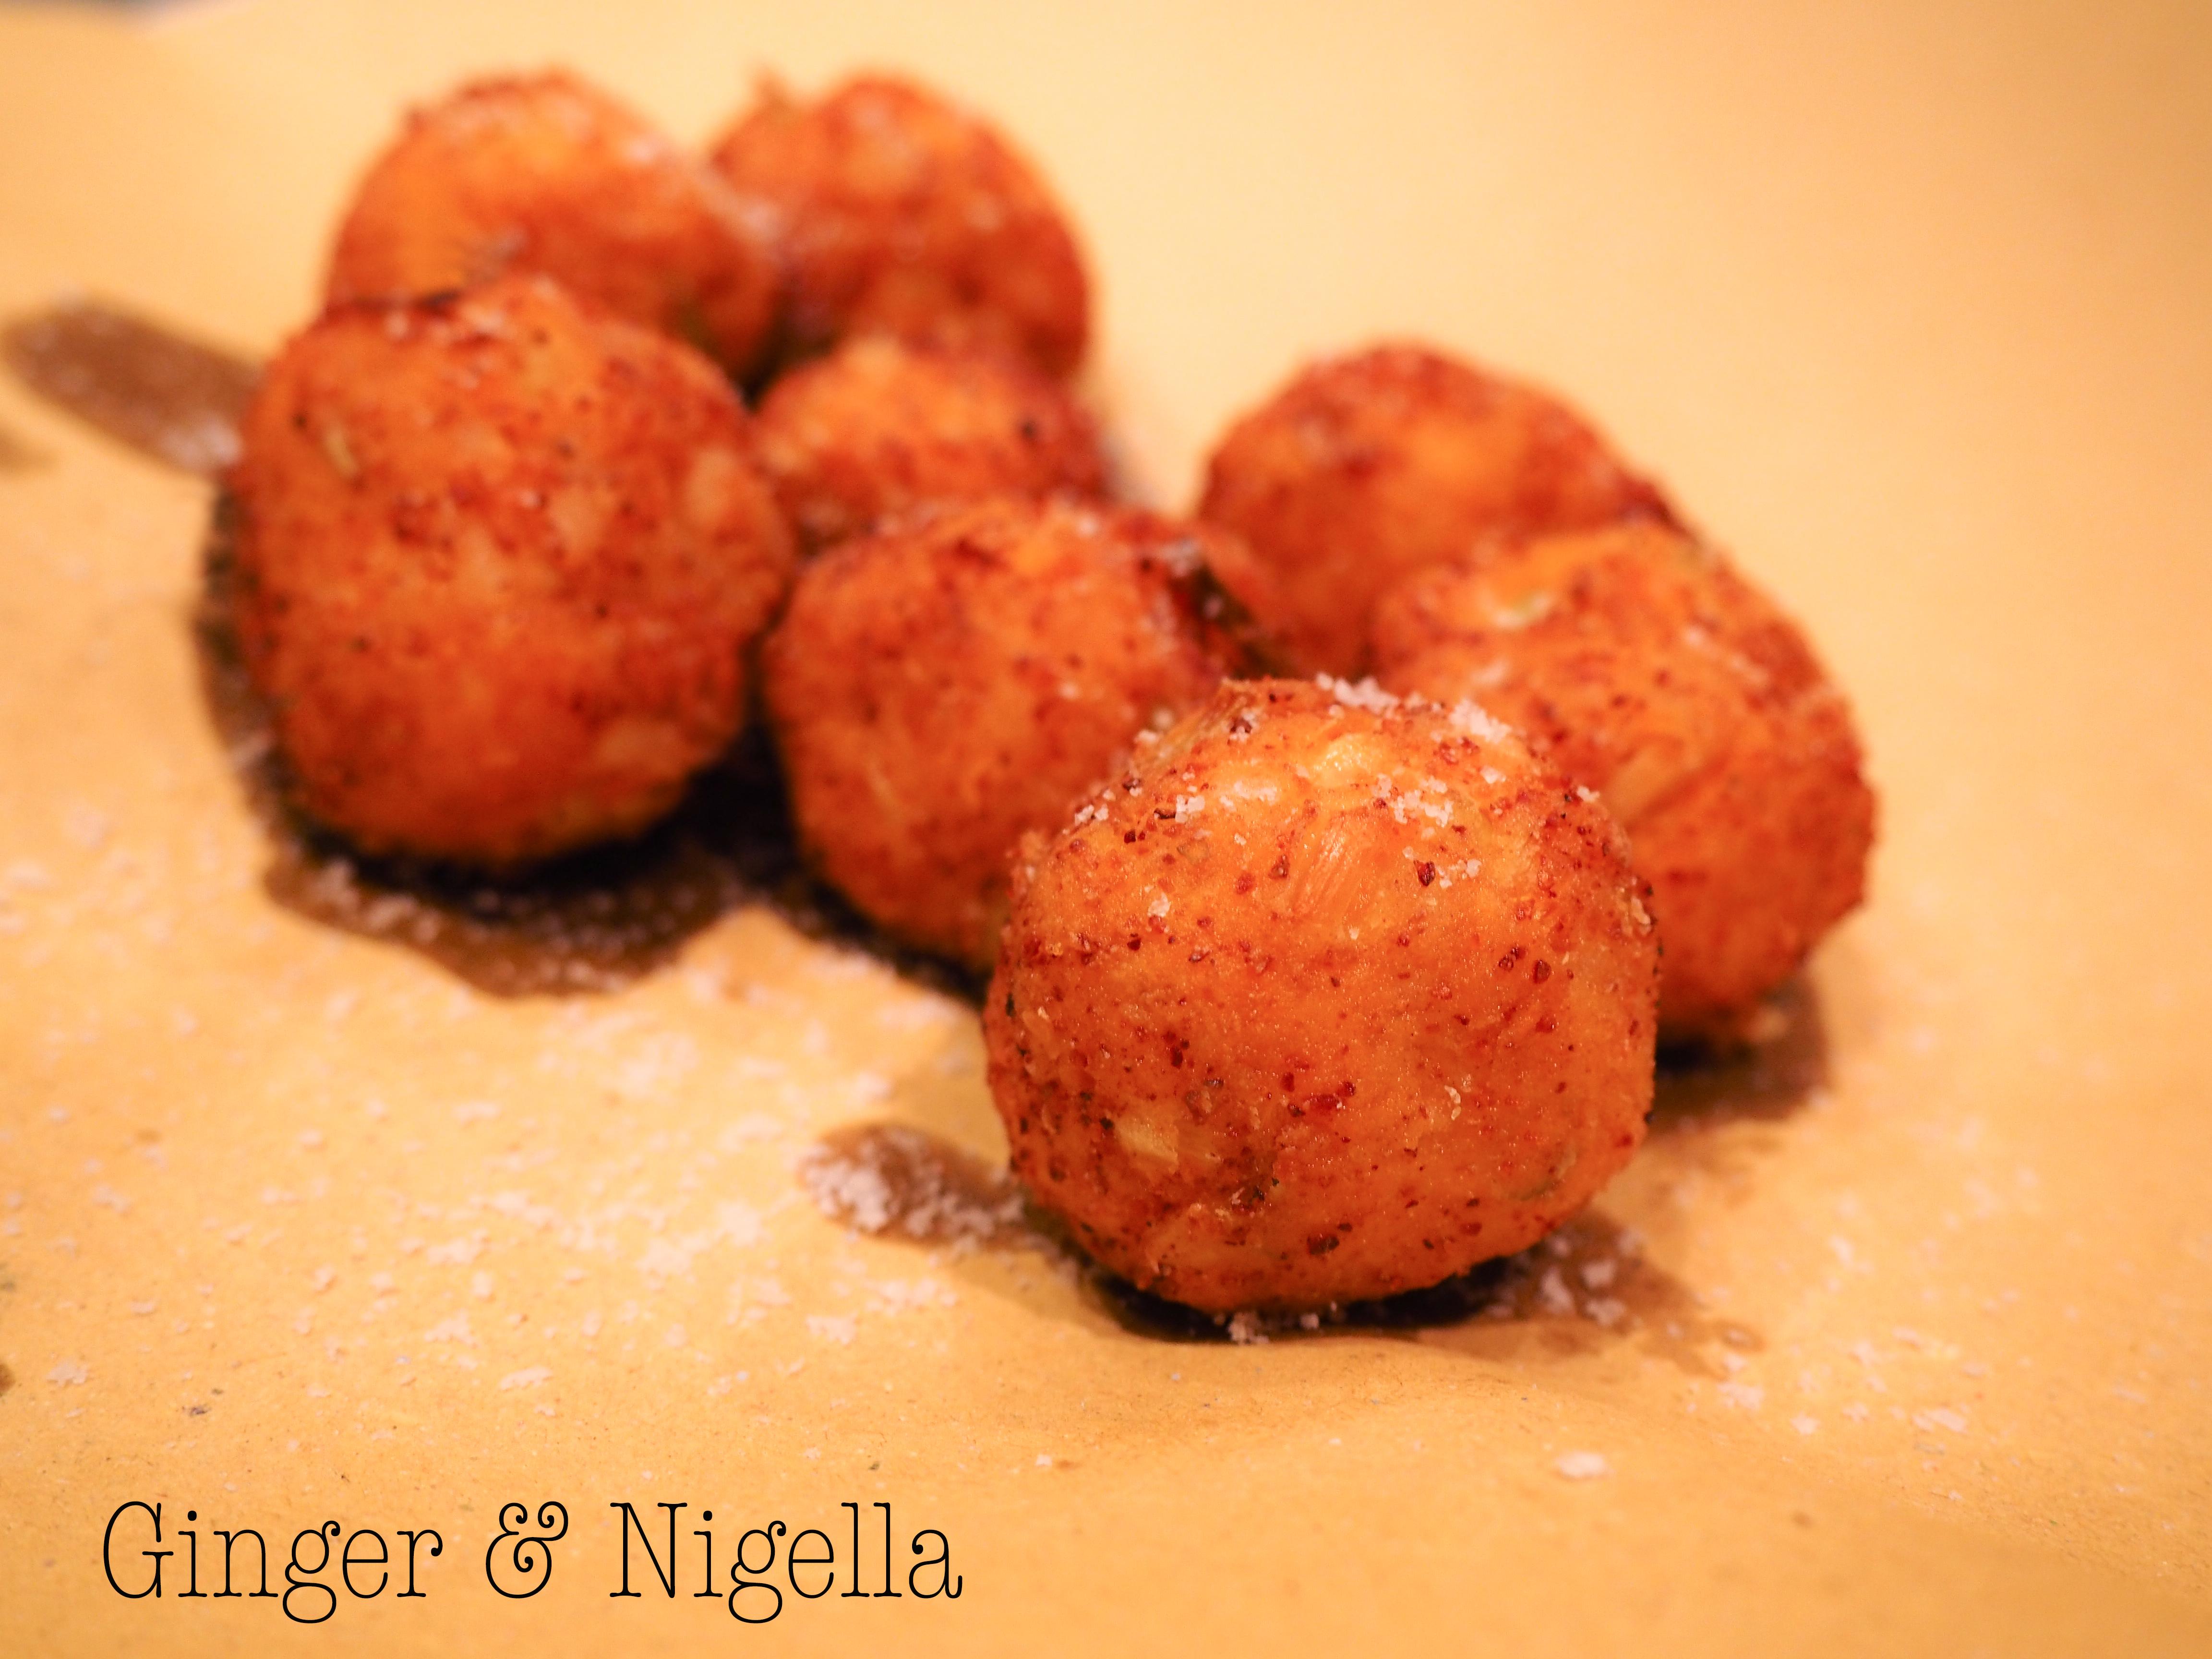 cucina vegetariana - ginger & nigella - Olio Di Sesamo Per Cucinare